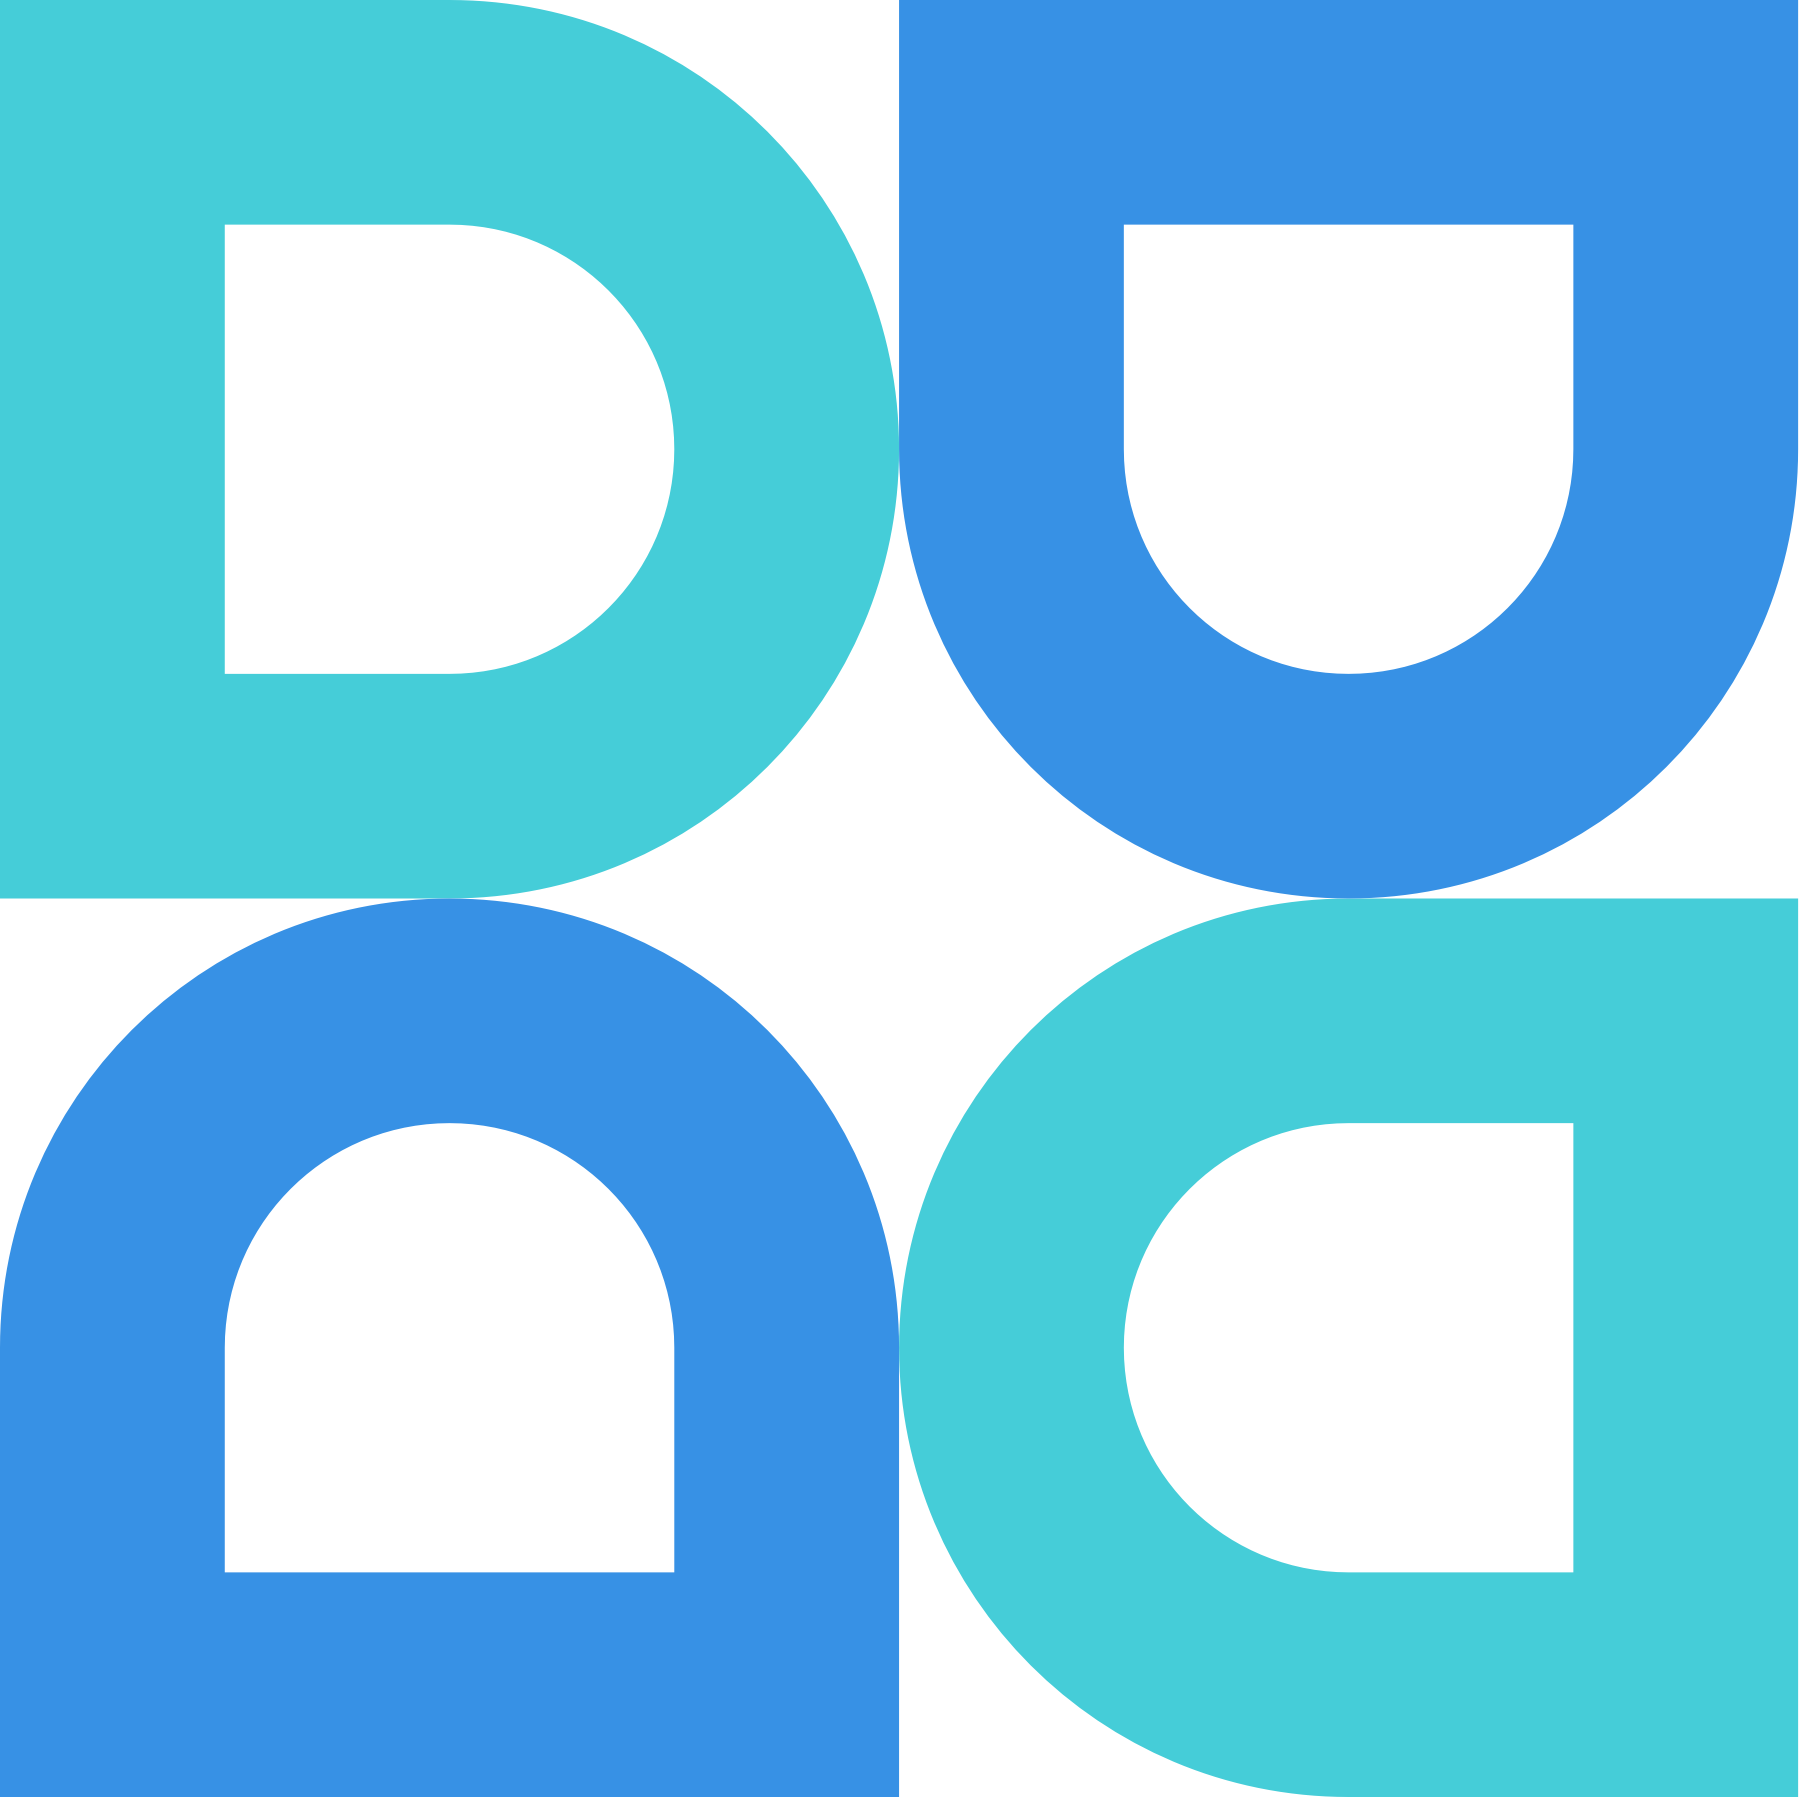 Denefits, LLC